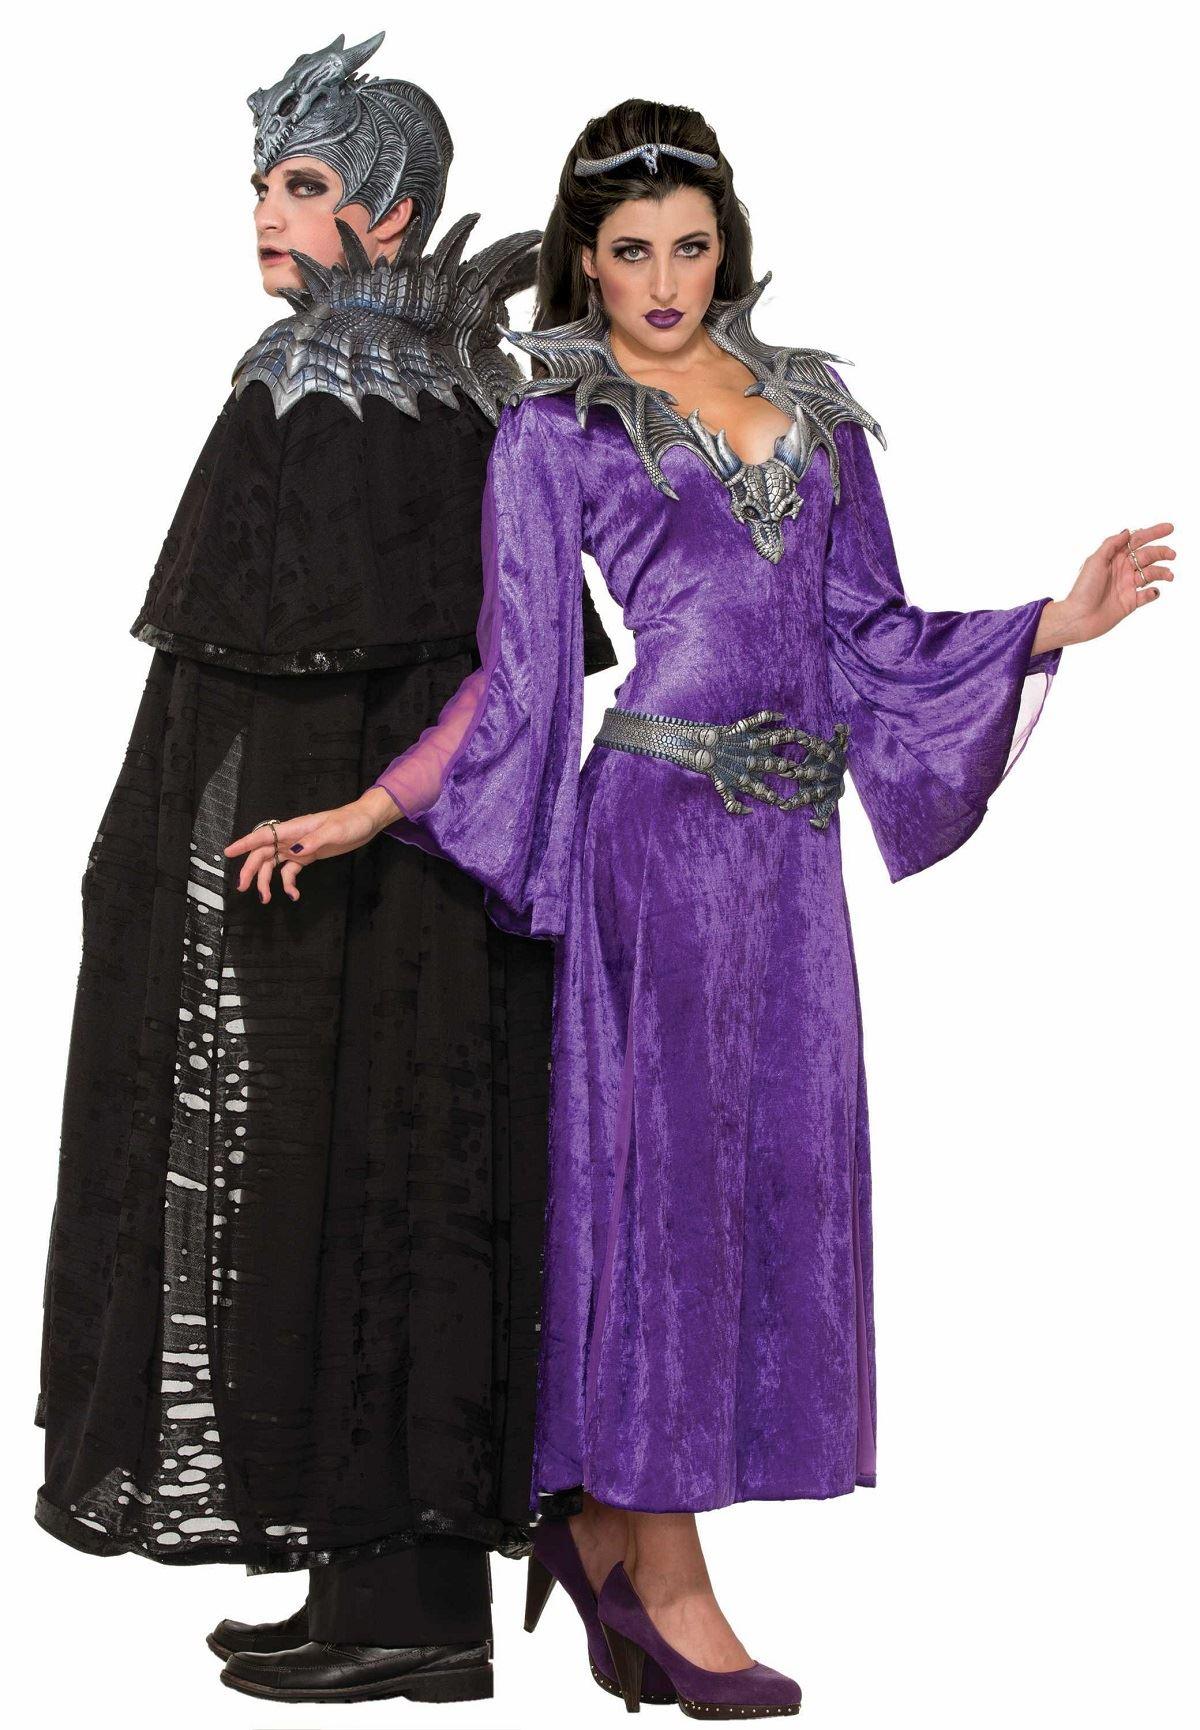 Sorceress Costume Costume Dragon Sorceress